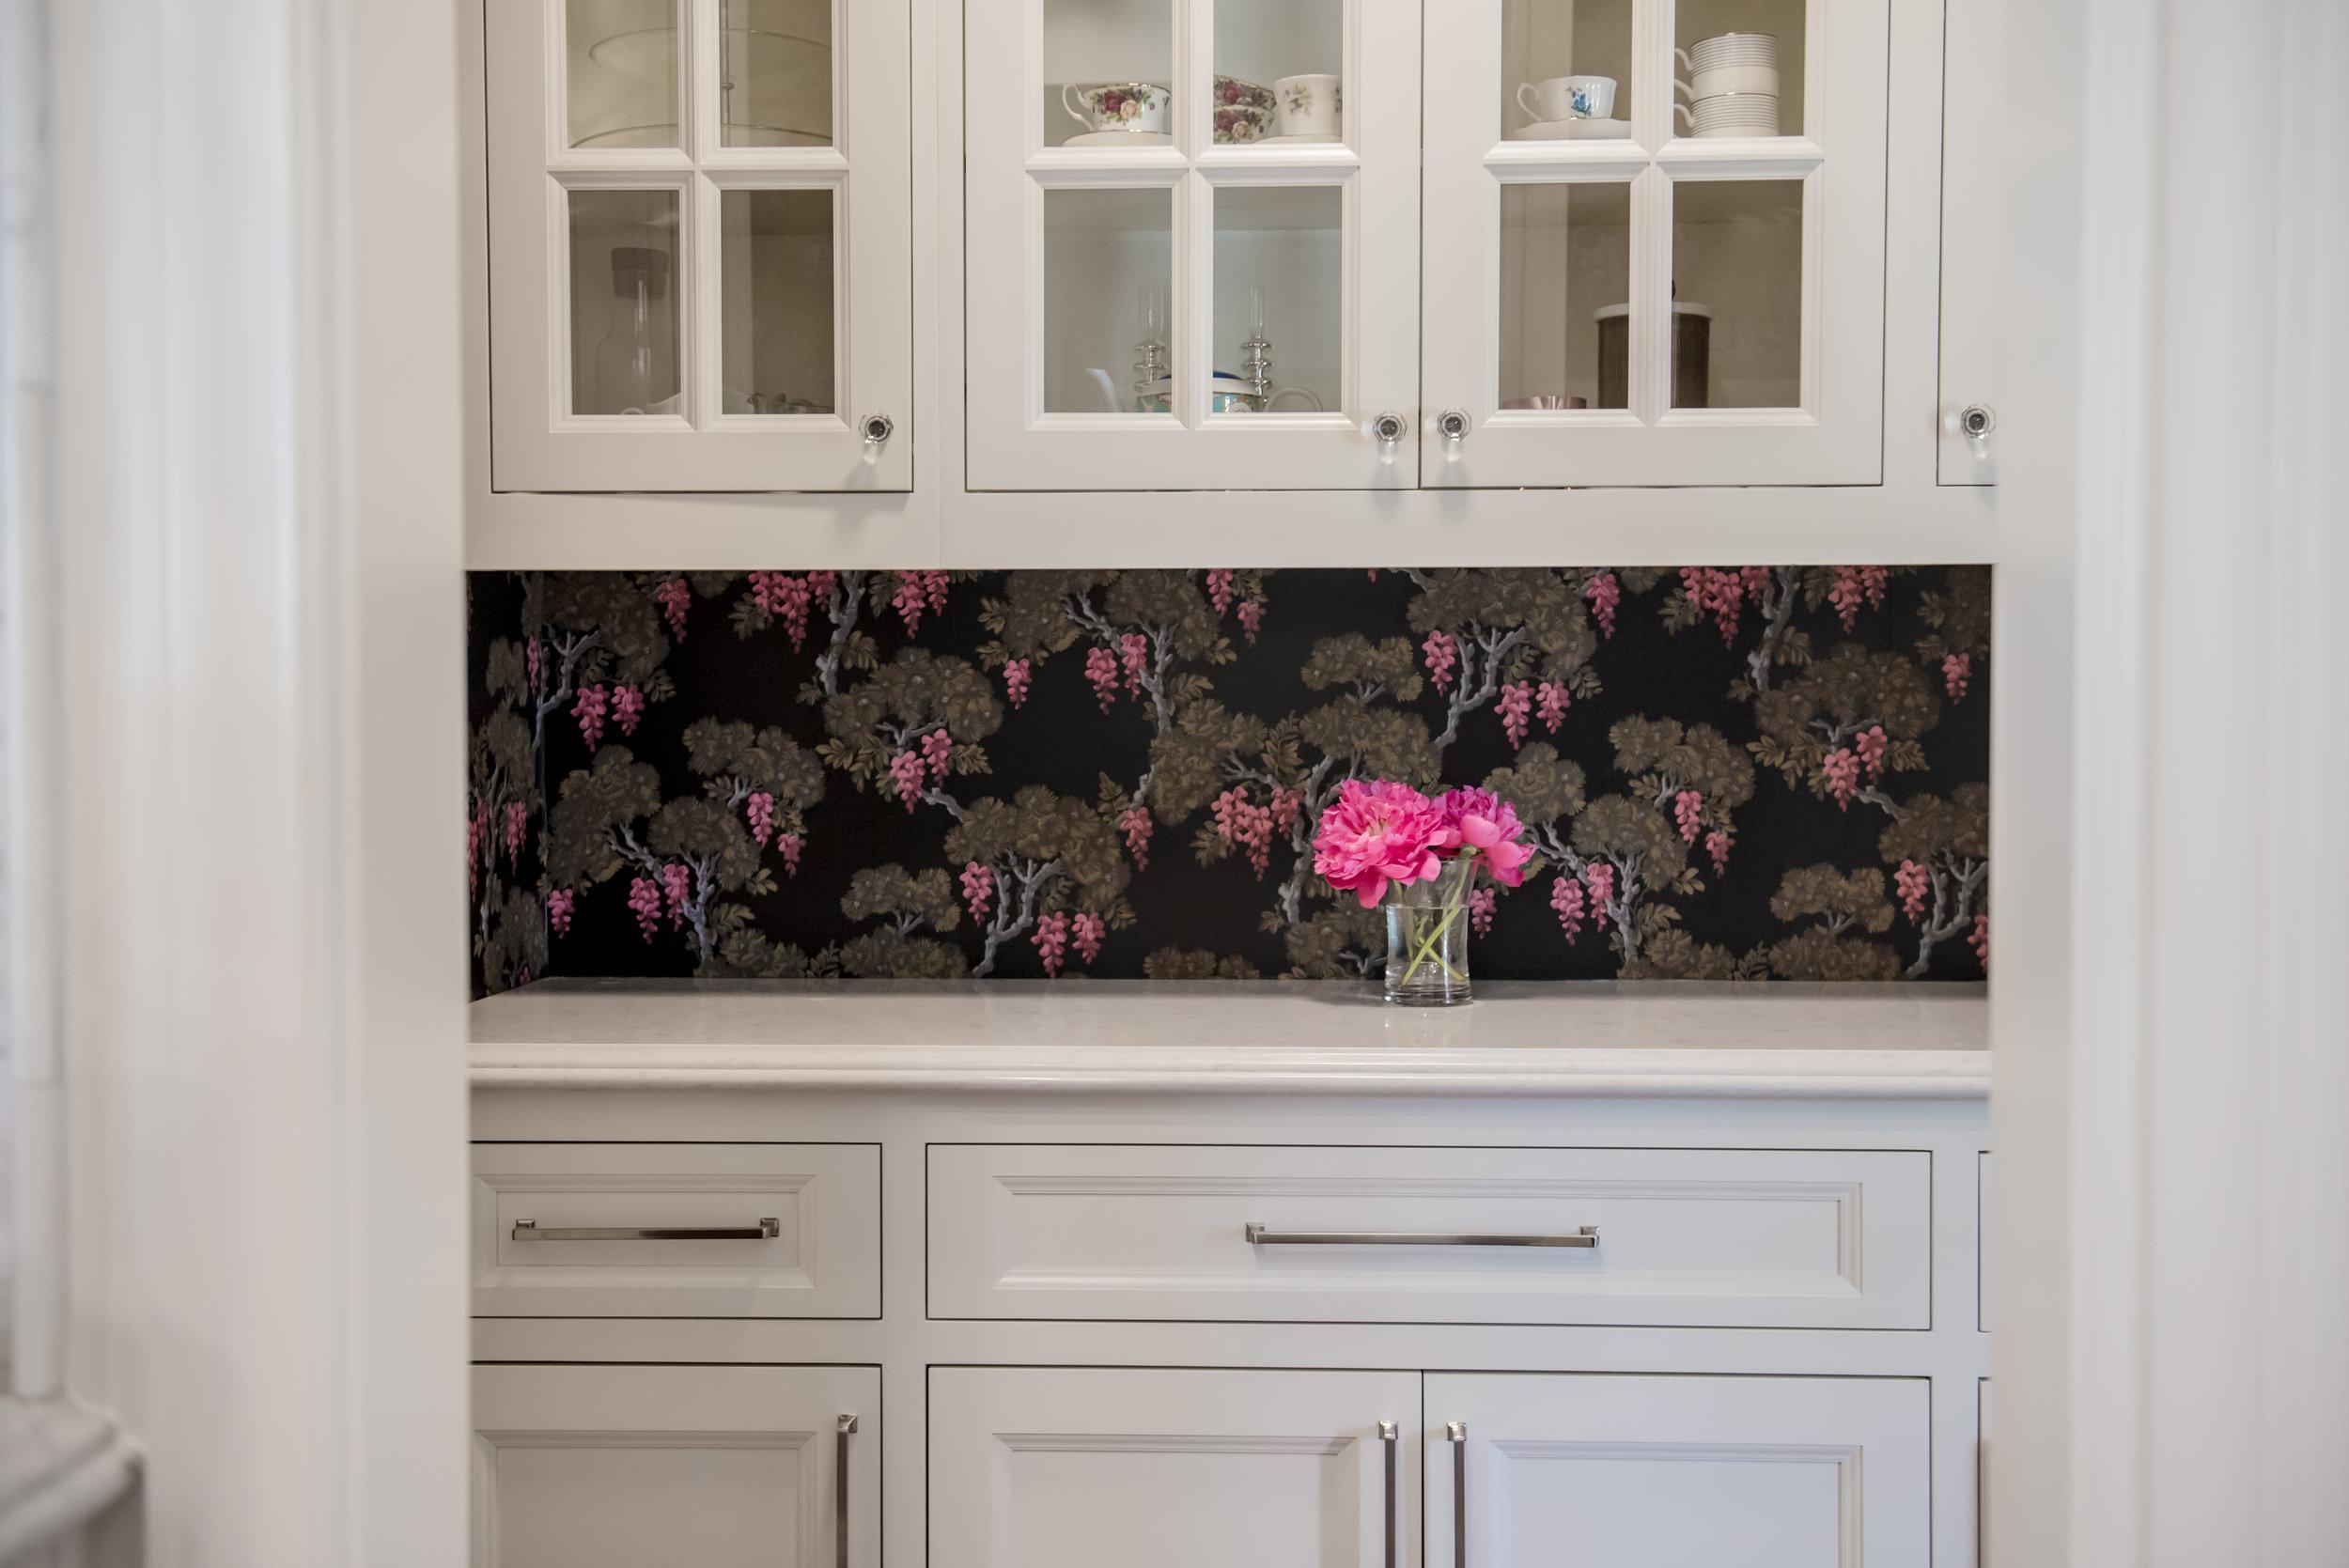 23+Butlers+Pantry+Wallpaper+Glasscabinets+Floral+Black+Bold (2).jpg